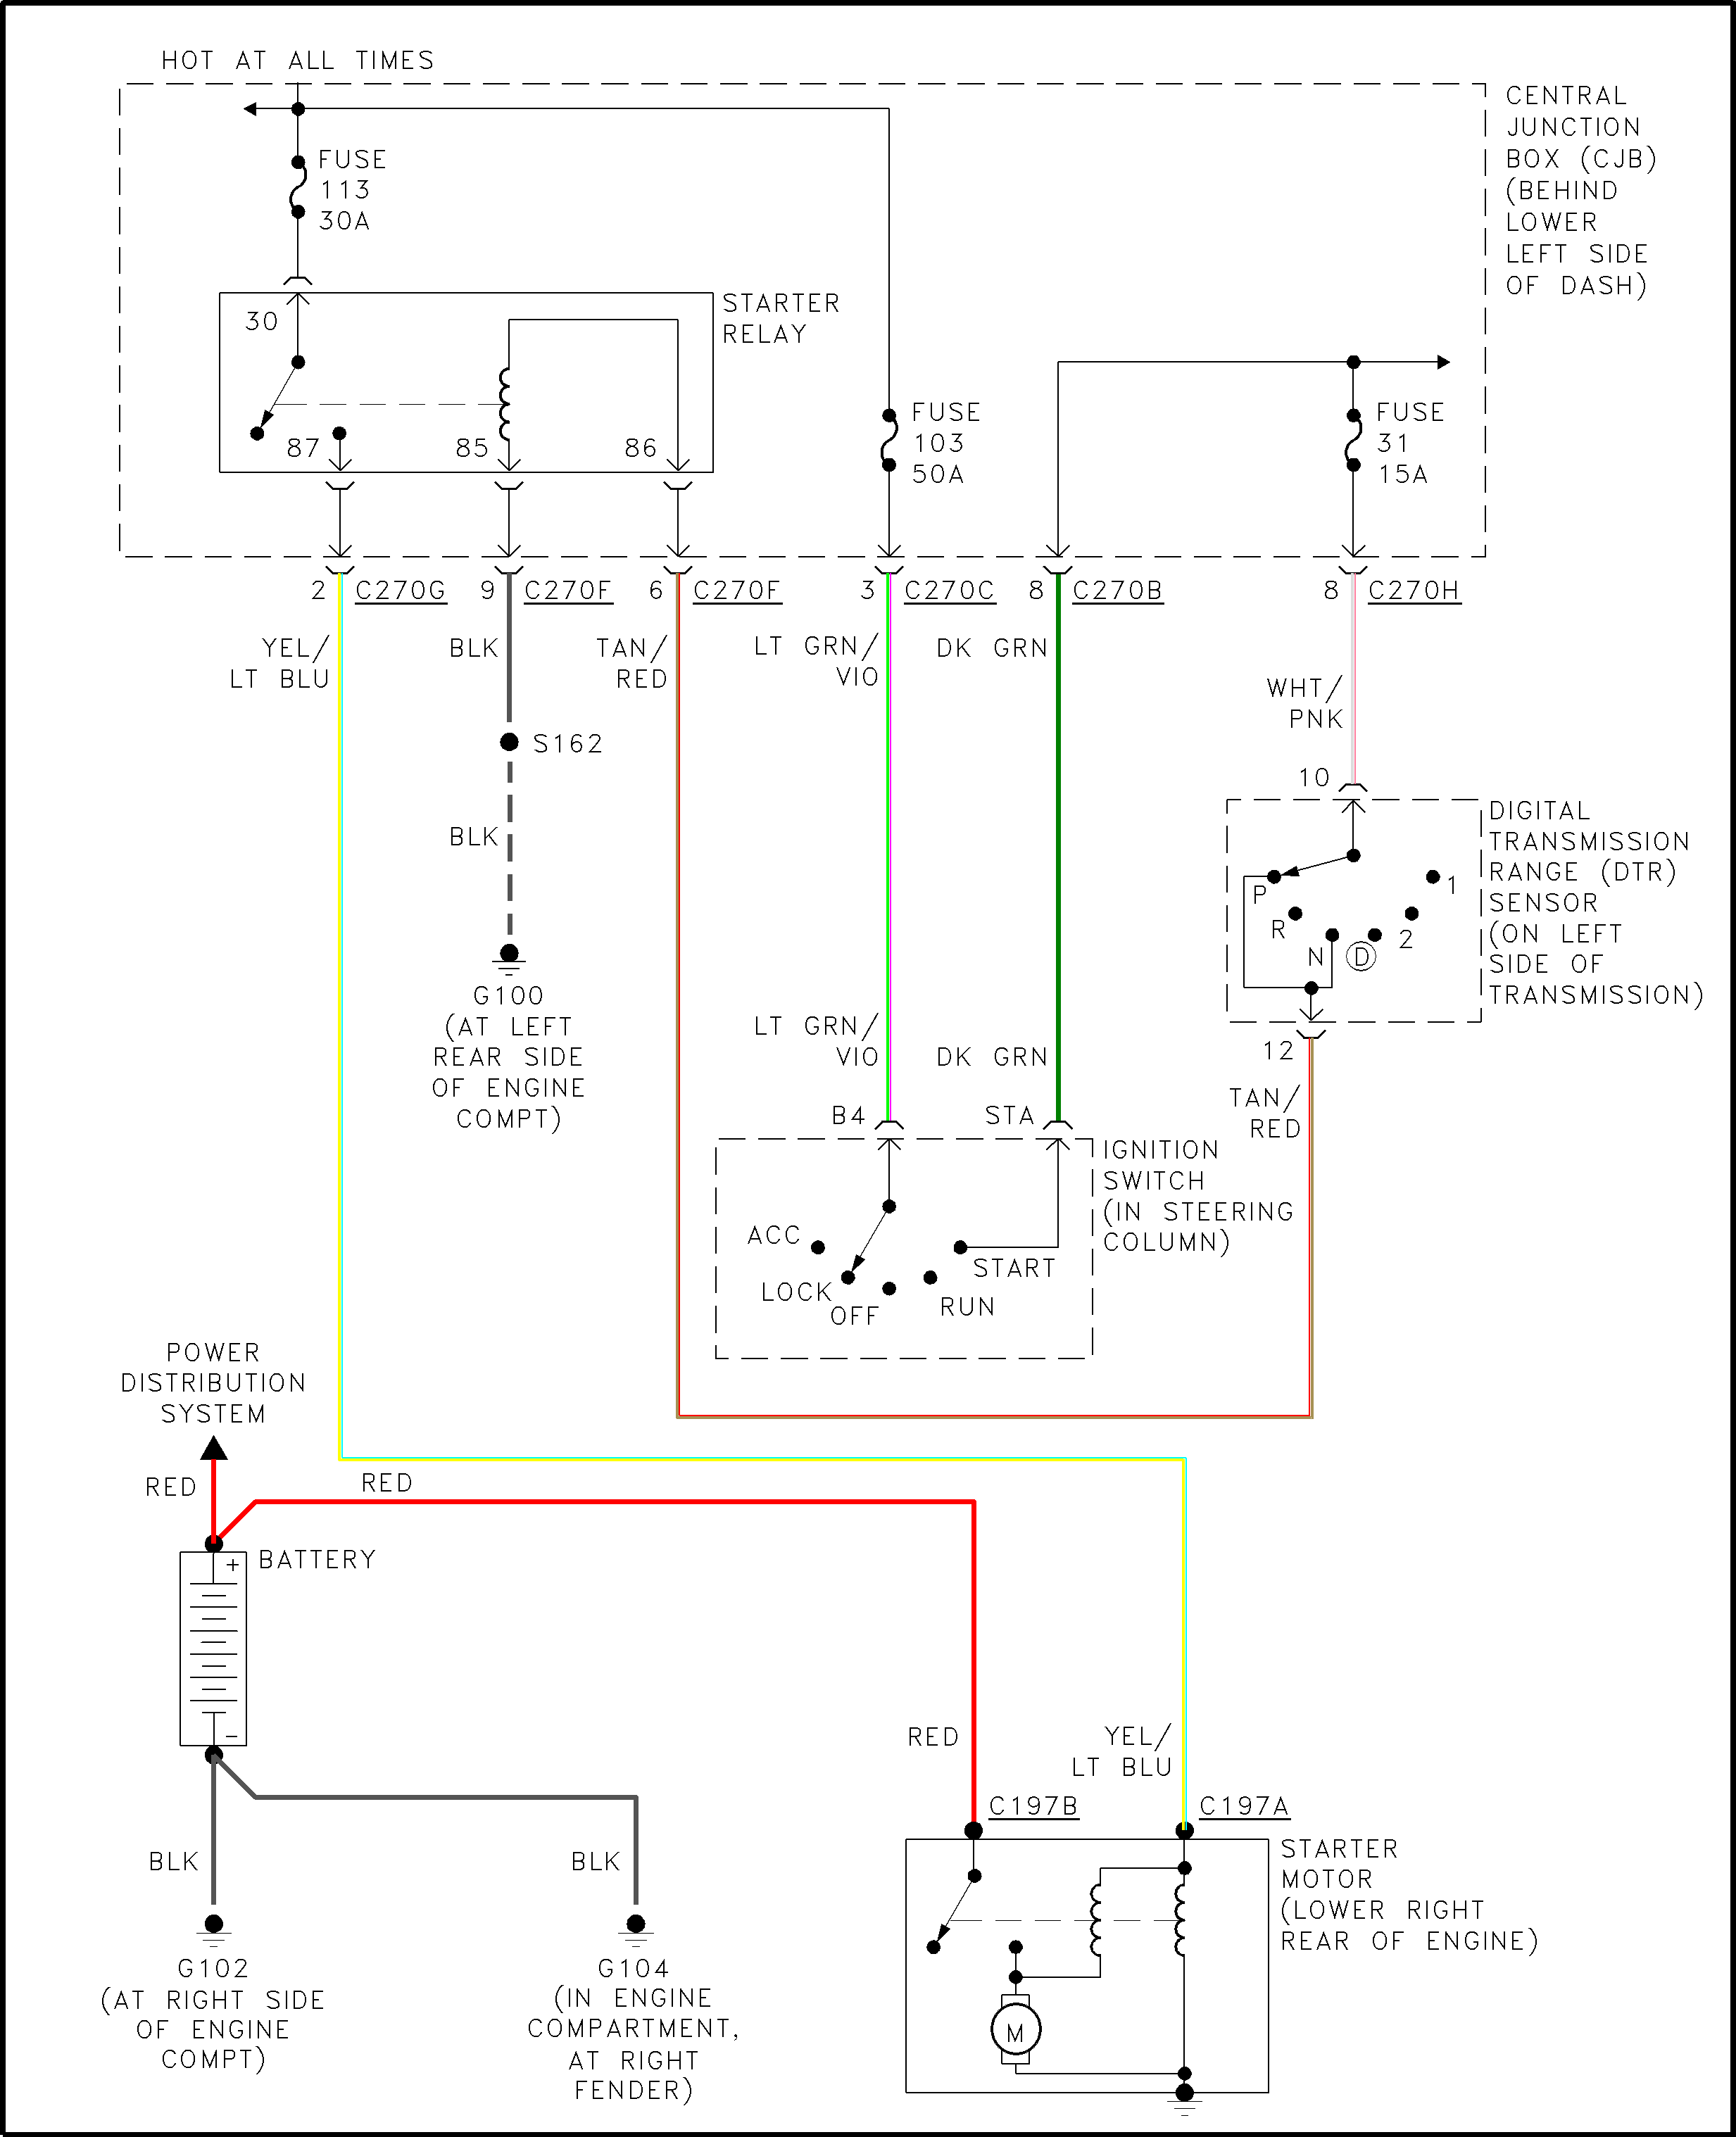 f840a3fe-cd74-42f3-a806-77b4da31c39d_starting circuit.png